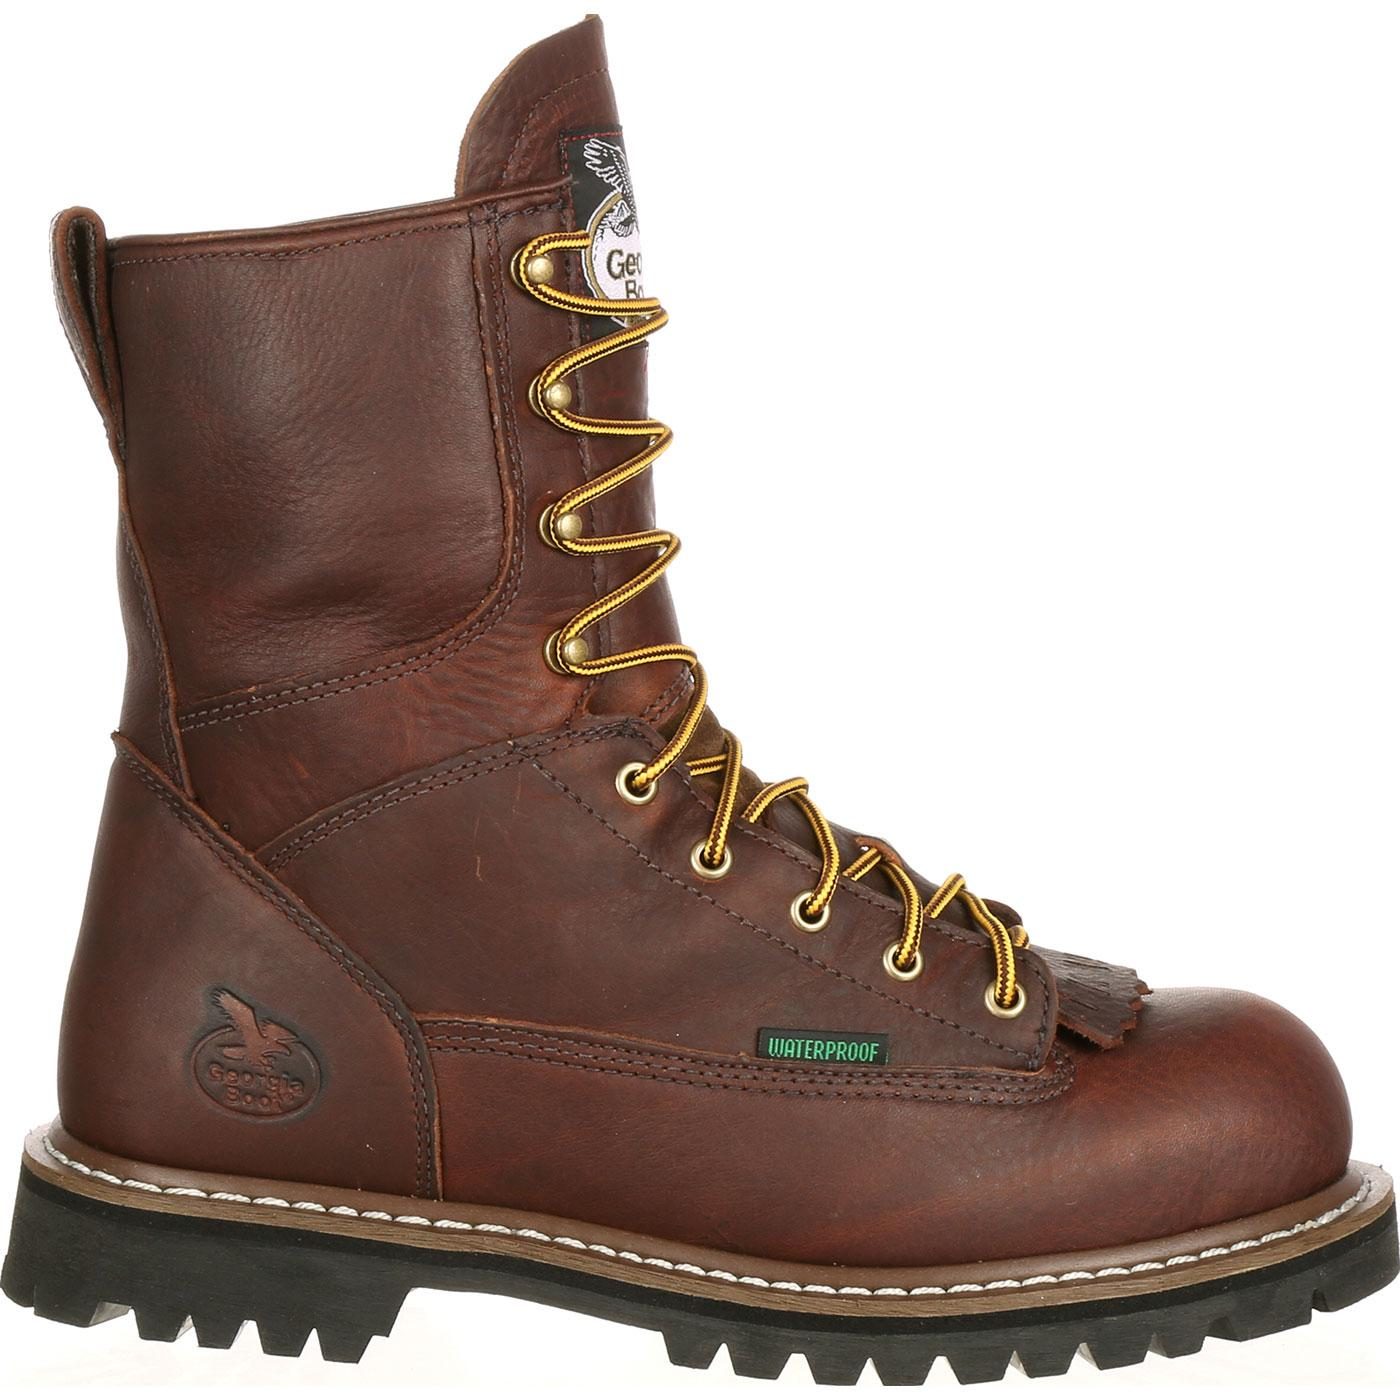 Georgia Steel Toe Waterproof Lace-To-Toe Work Boot, G103